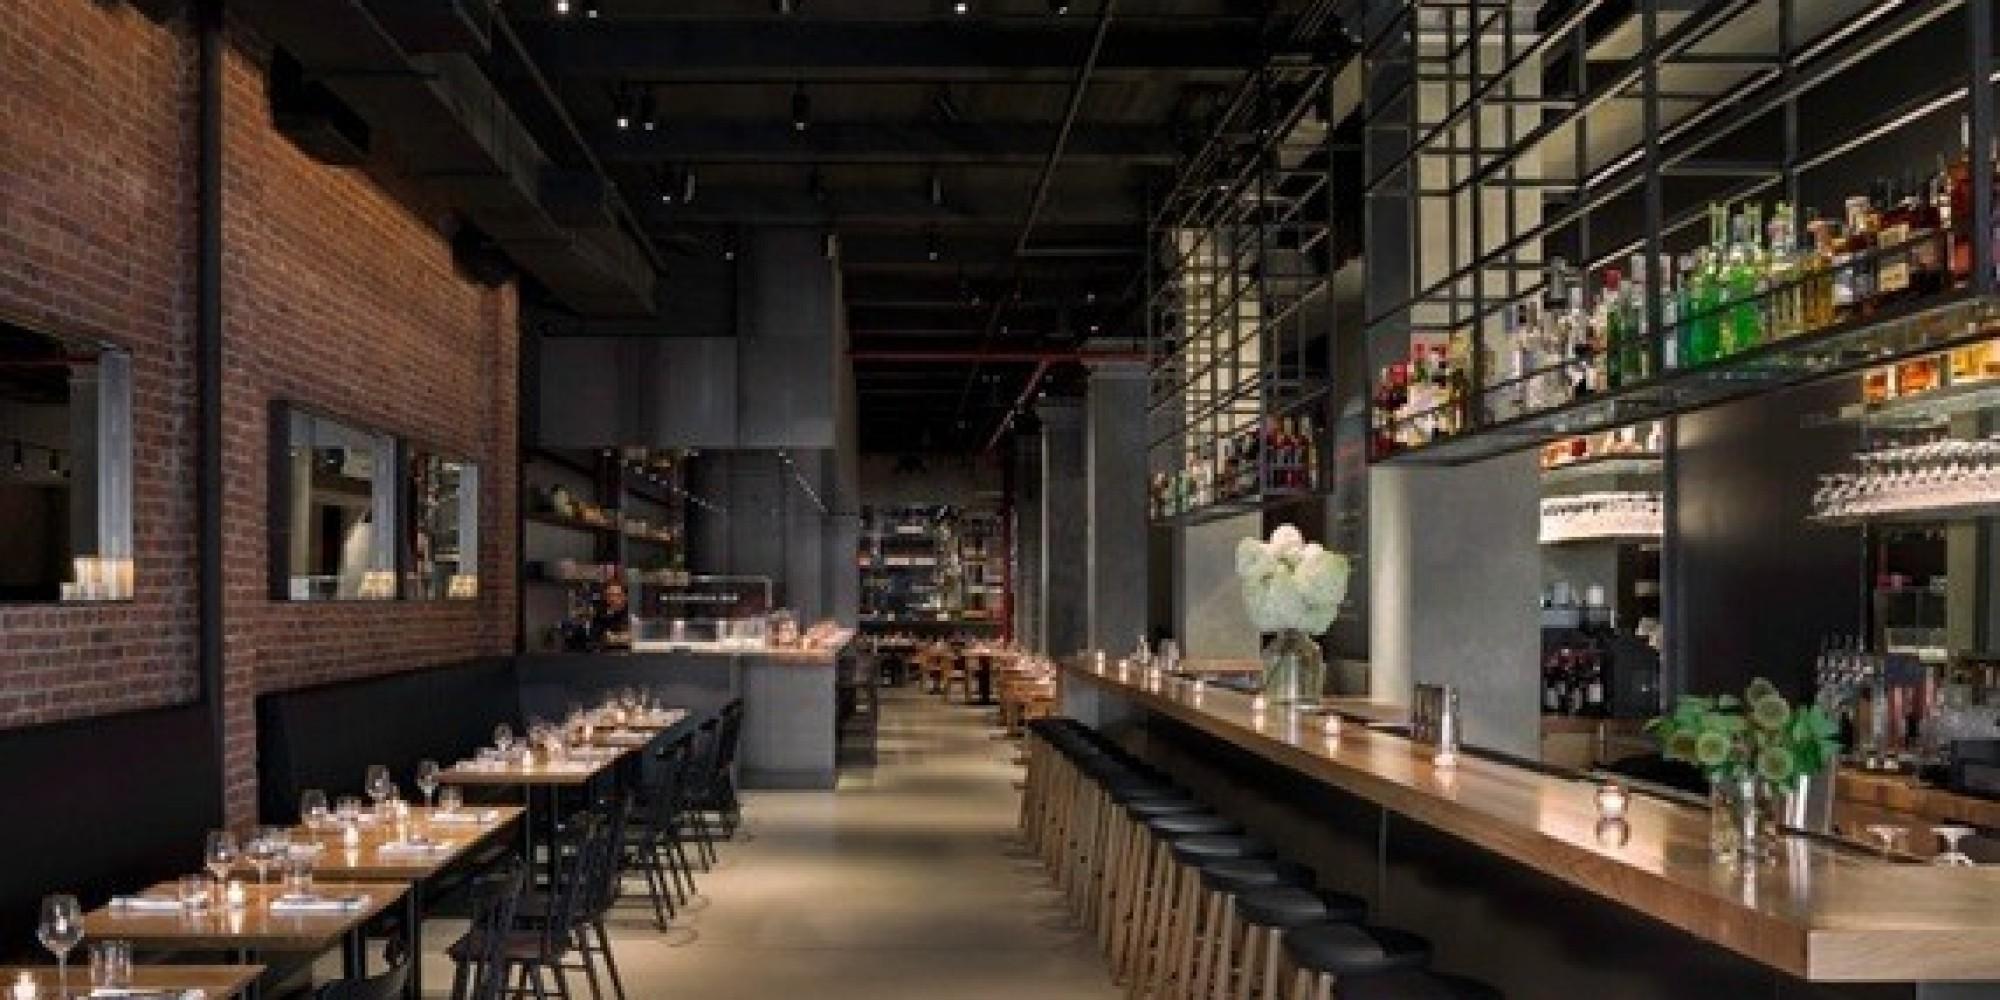 Obic 224 Opens Mozzarella Bar Flagship In Nyc S Flatiron